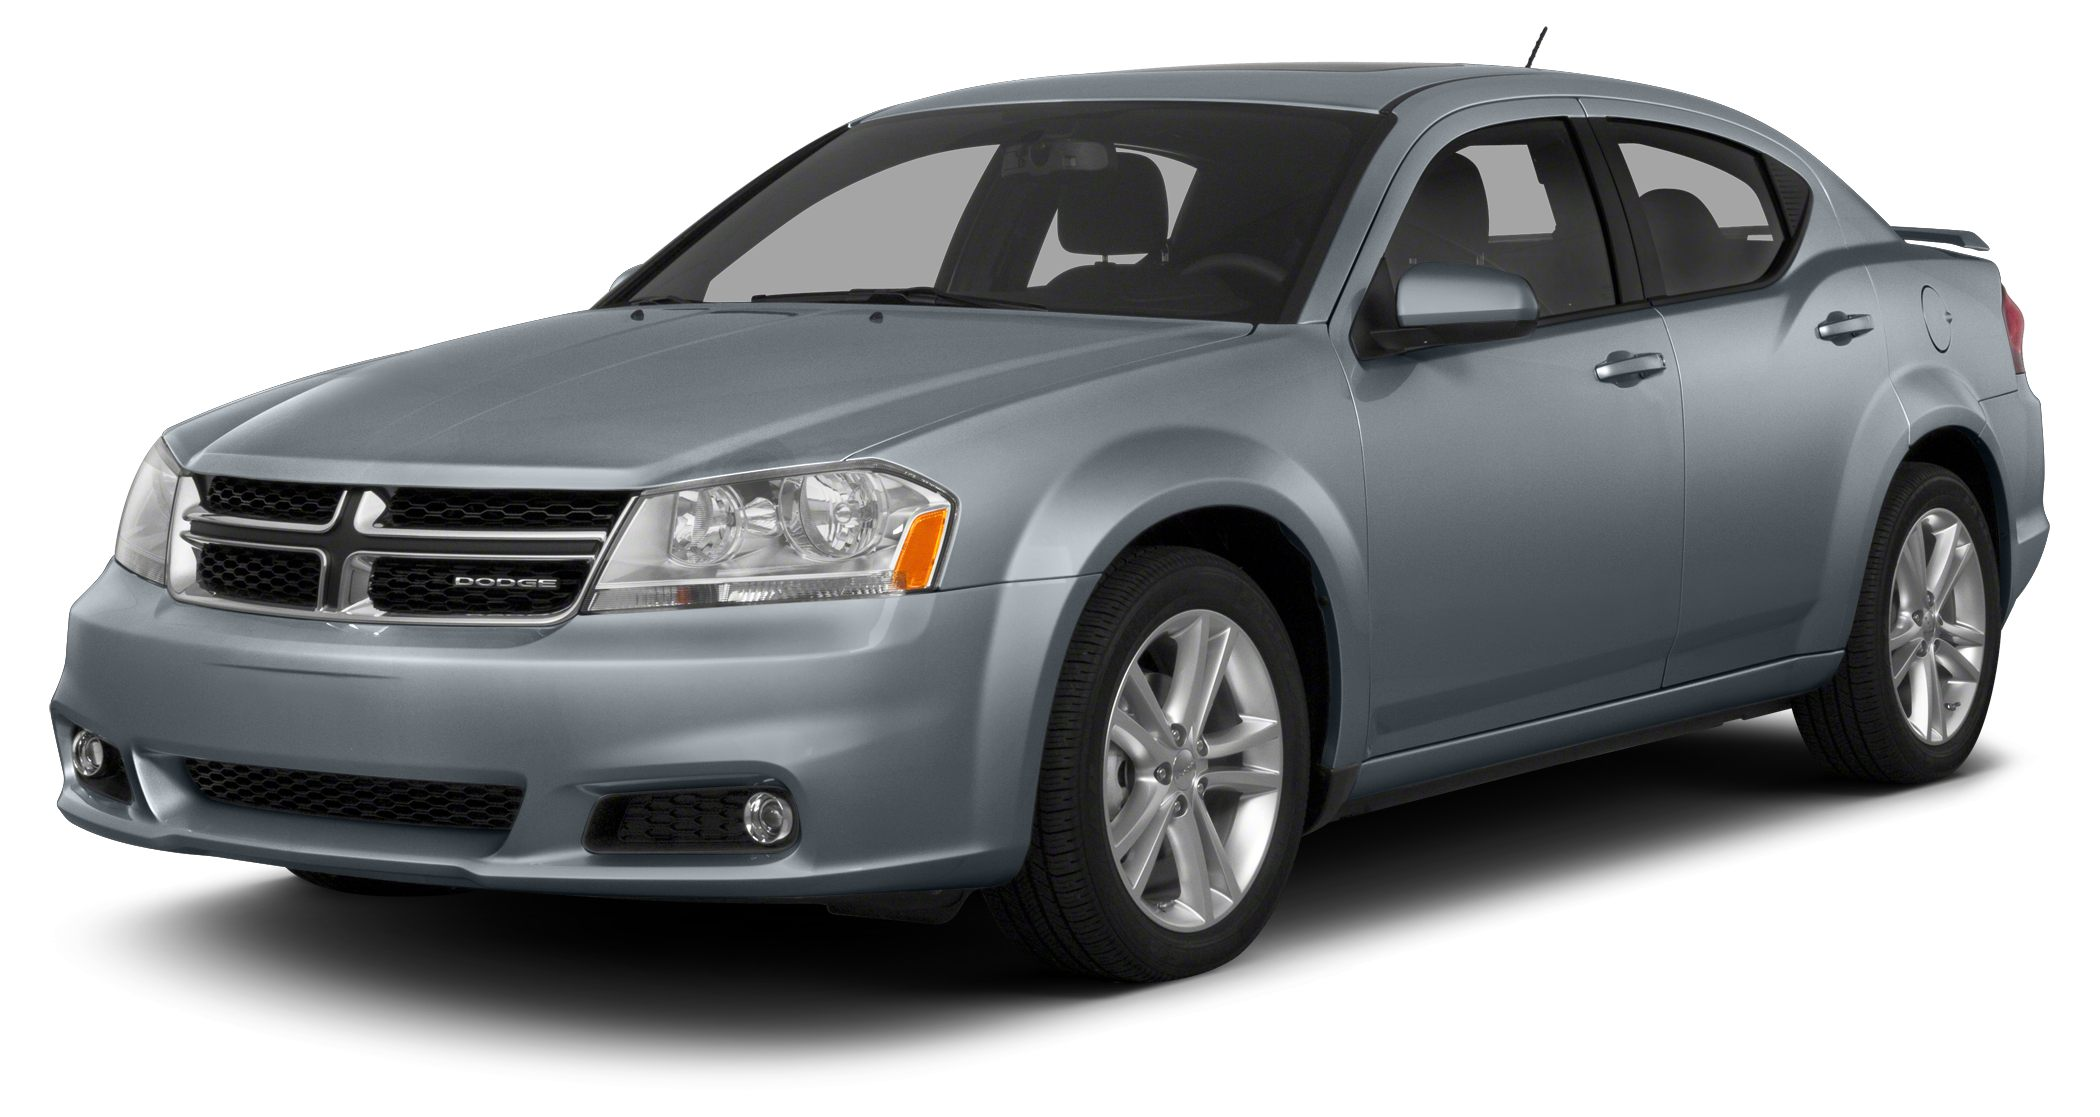 2013 Dodge Avenger SE Dodge Certified CARFAX 1-Owner Clean GREAT MILES 42797 FUEL EFFICIENT 2